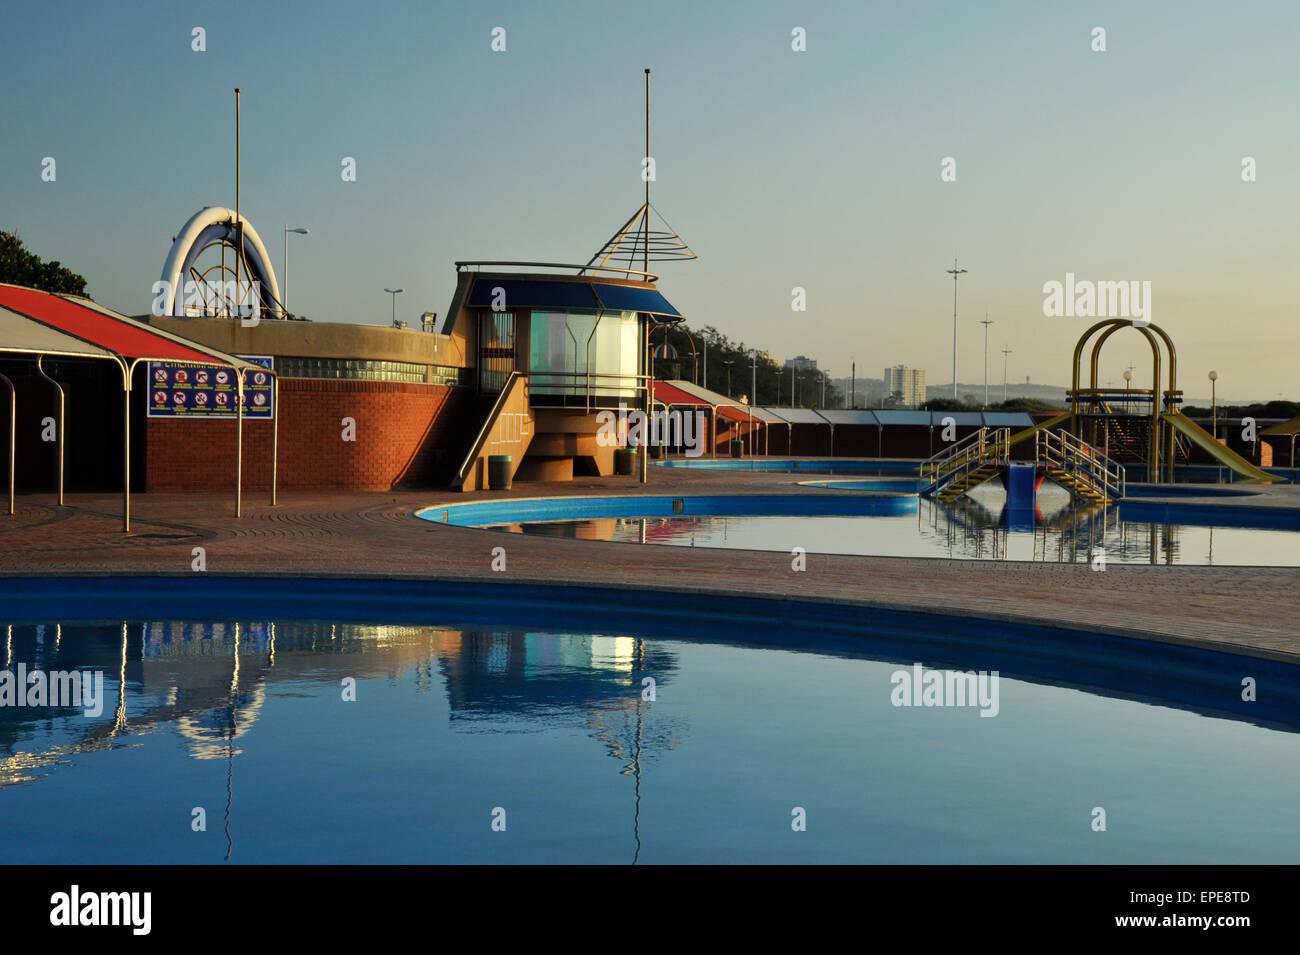 Community facilities stock photos community facilities - Swimming pools in bishops stortford ...